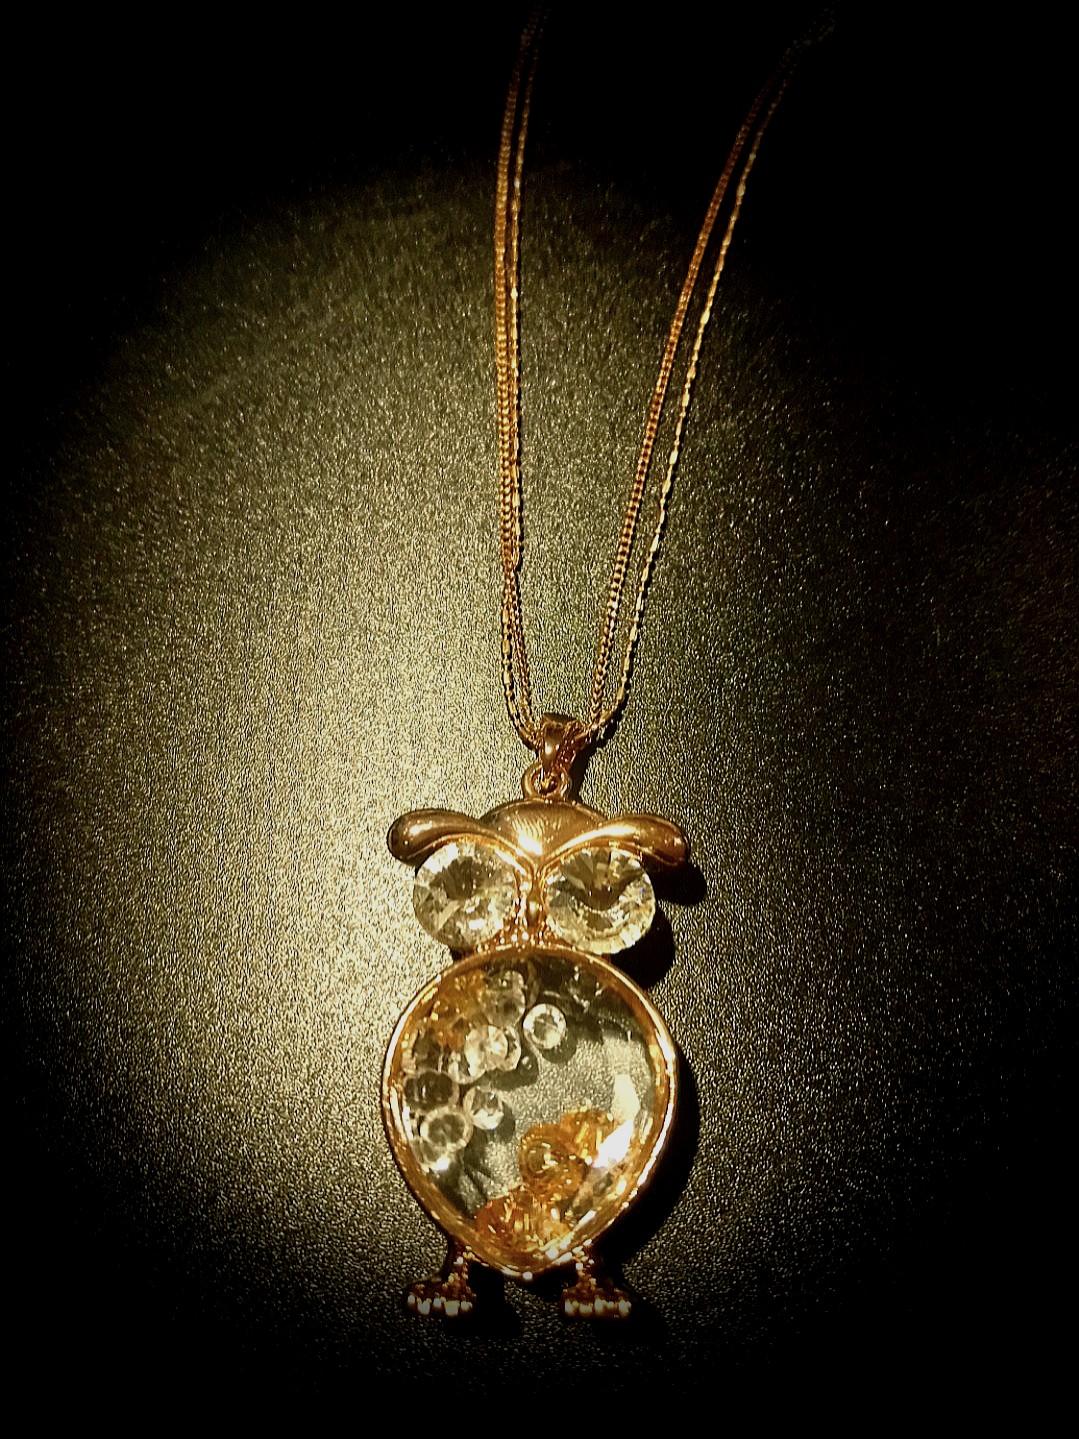 Crystal Golden Owl Necklace